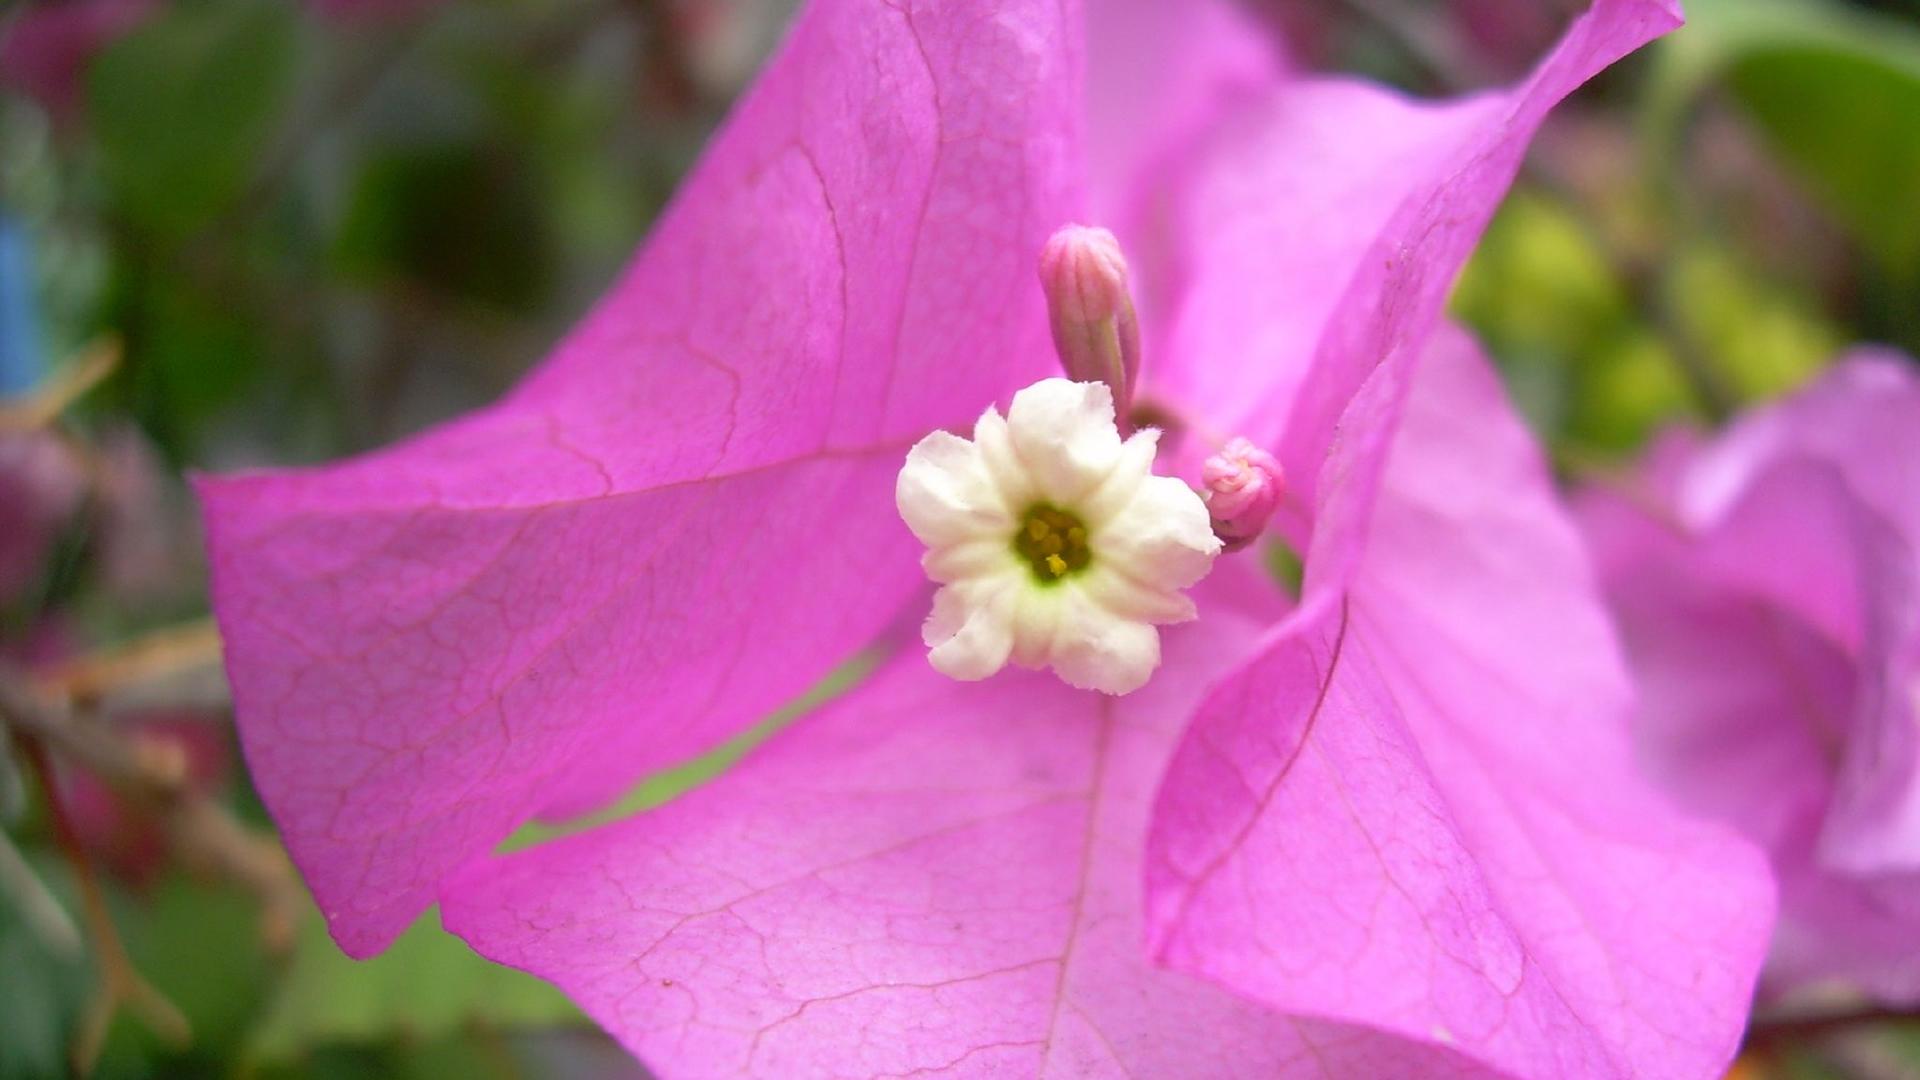 Pink Flower HD Wallpaper 1080p HD Wallpapers 1920x1080